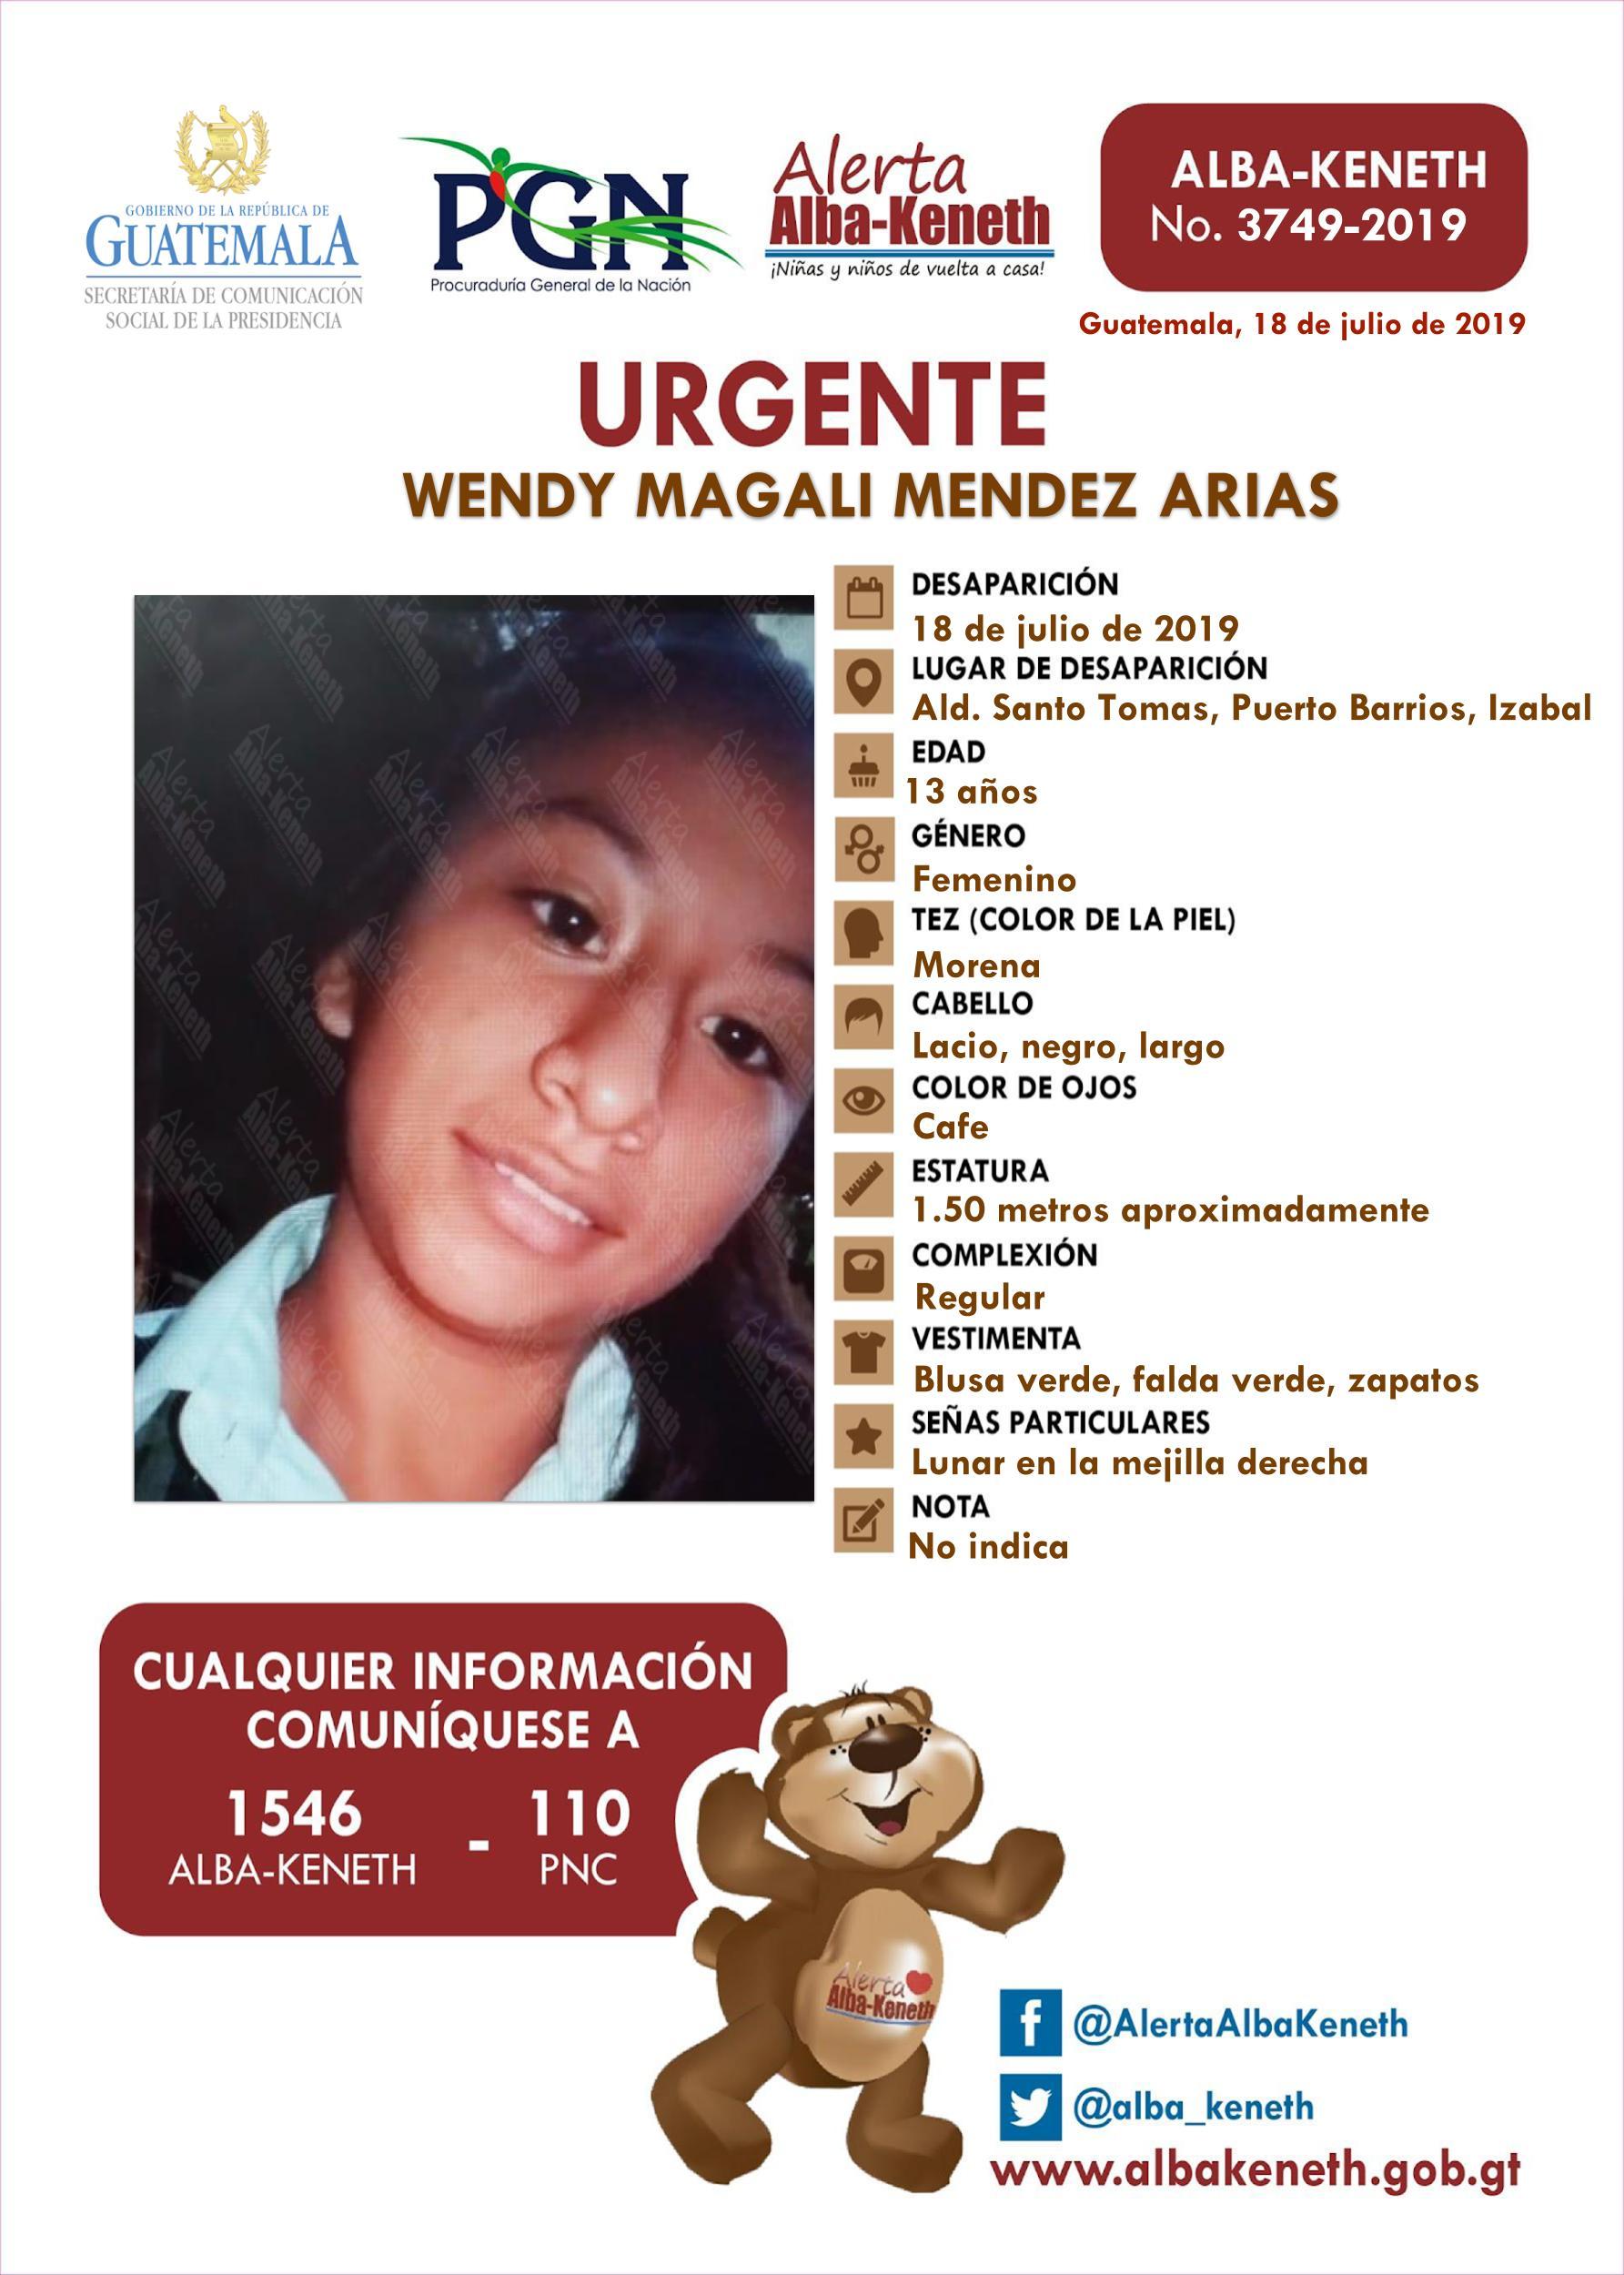 Wendy Magali Mendez Arias